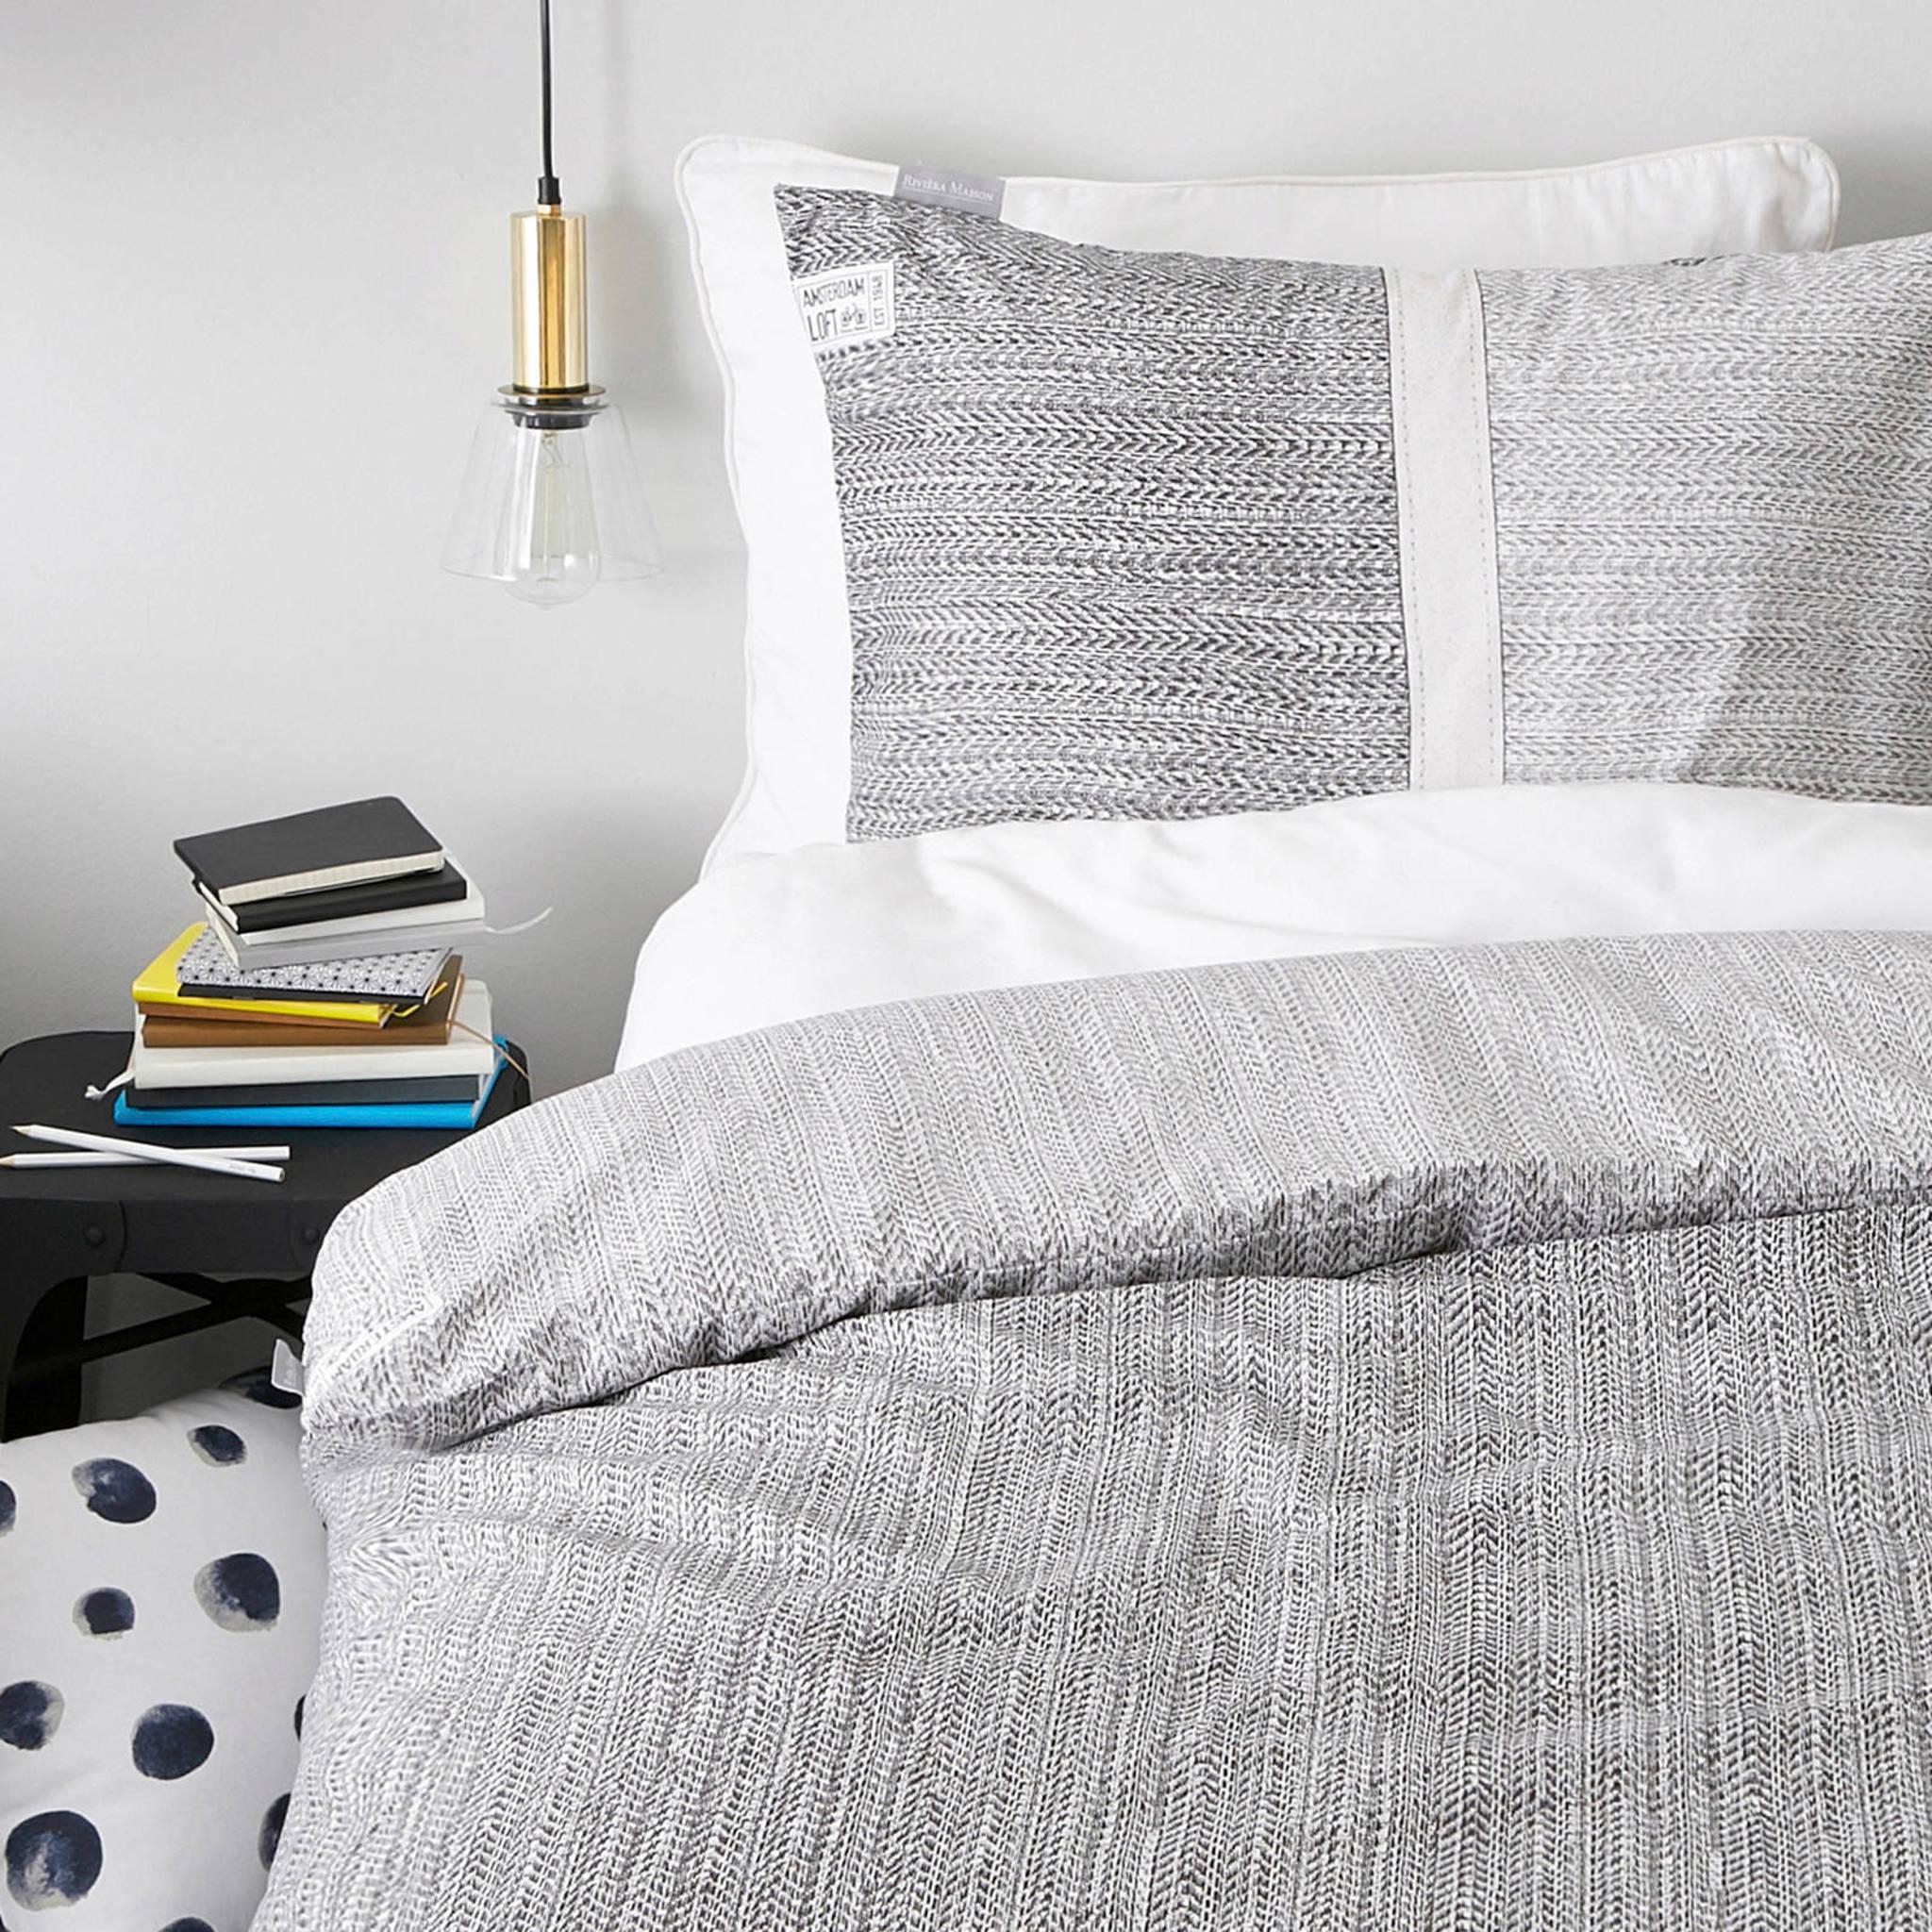 riviera maison katoenen dekbedovertrek lits jumeaux grijs